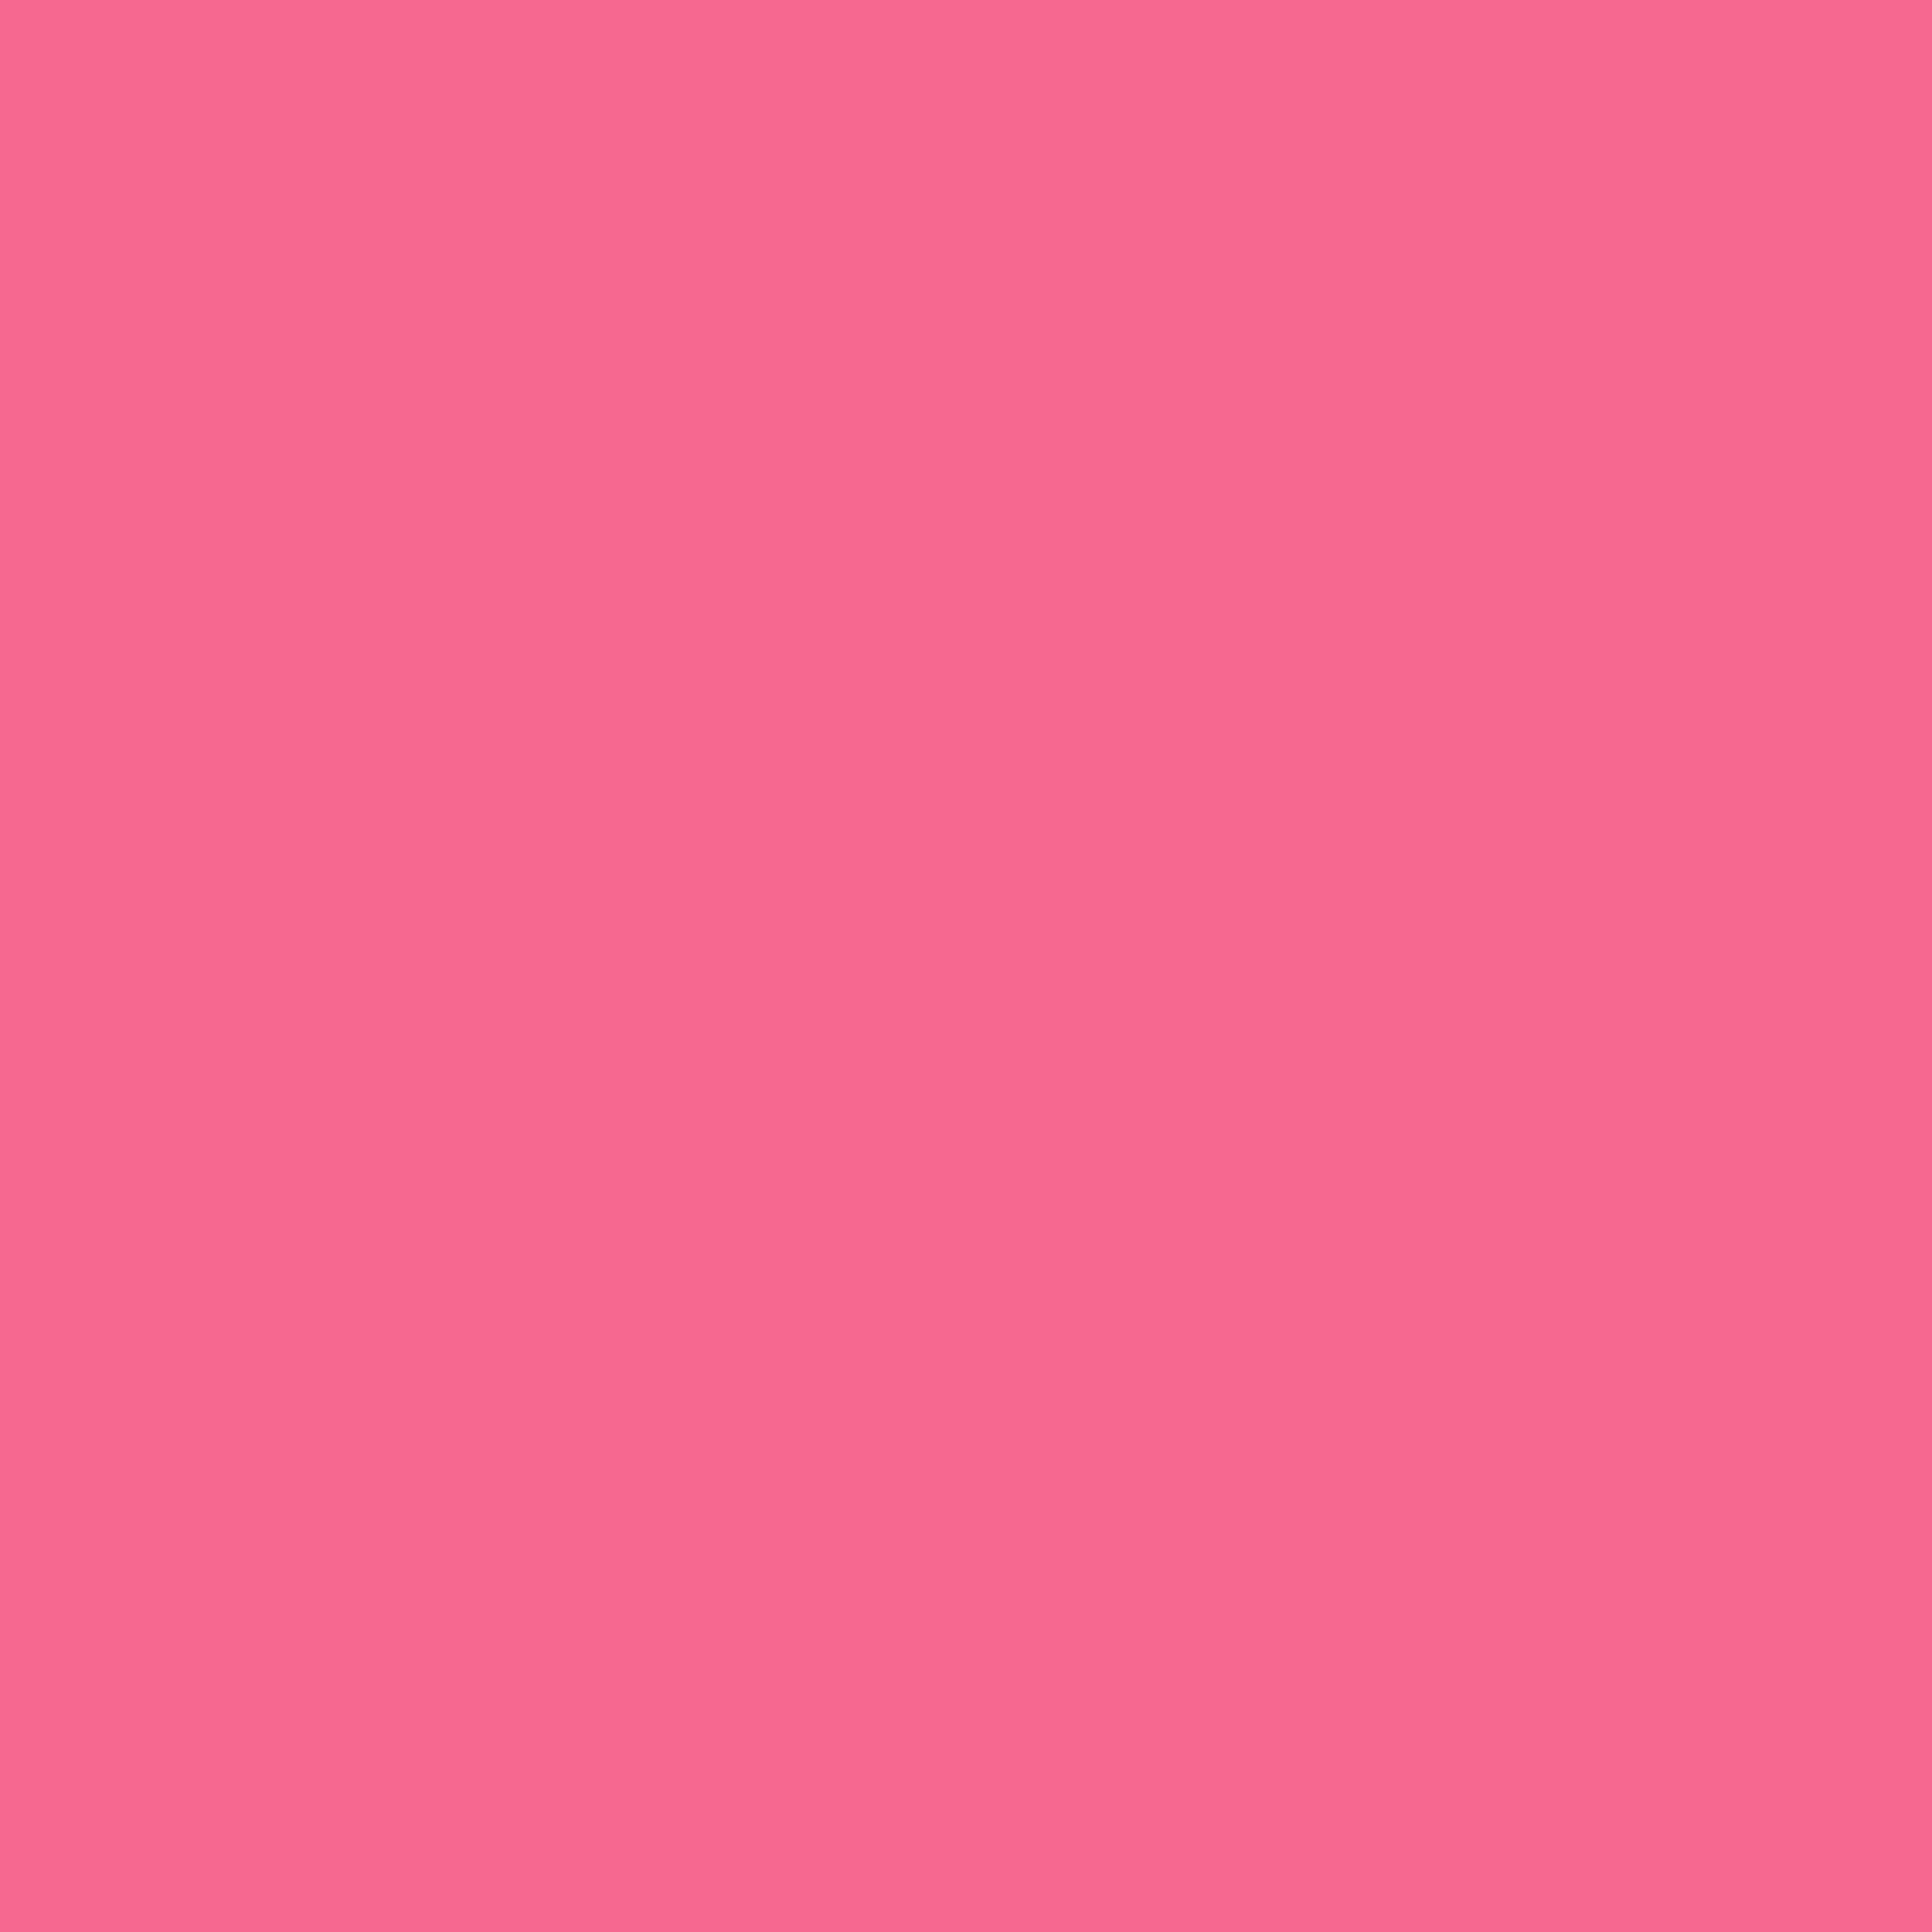 2048x2048 Light Crimson Solid Color Background